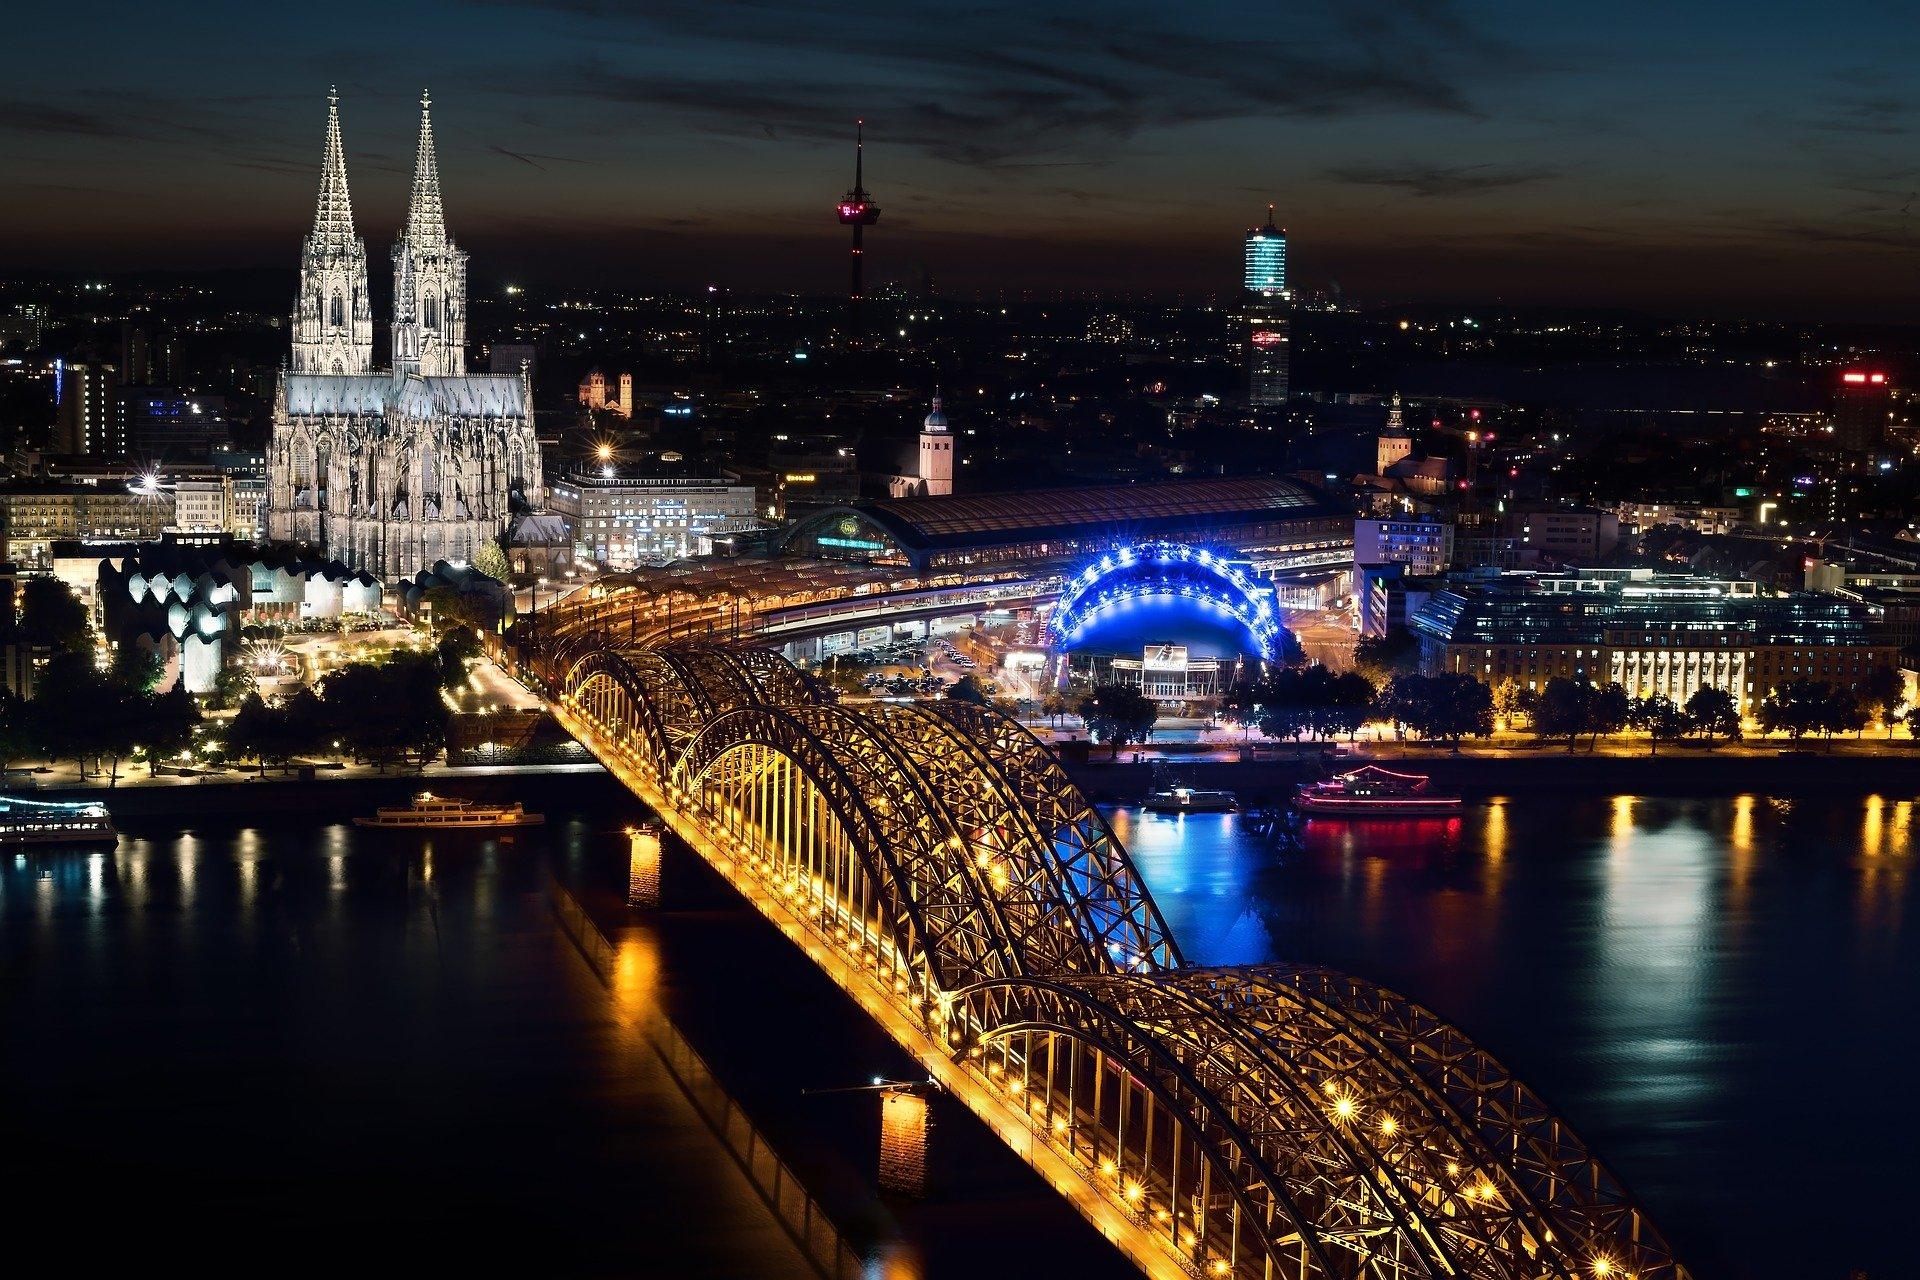 IVF Köln